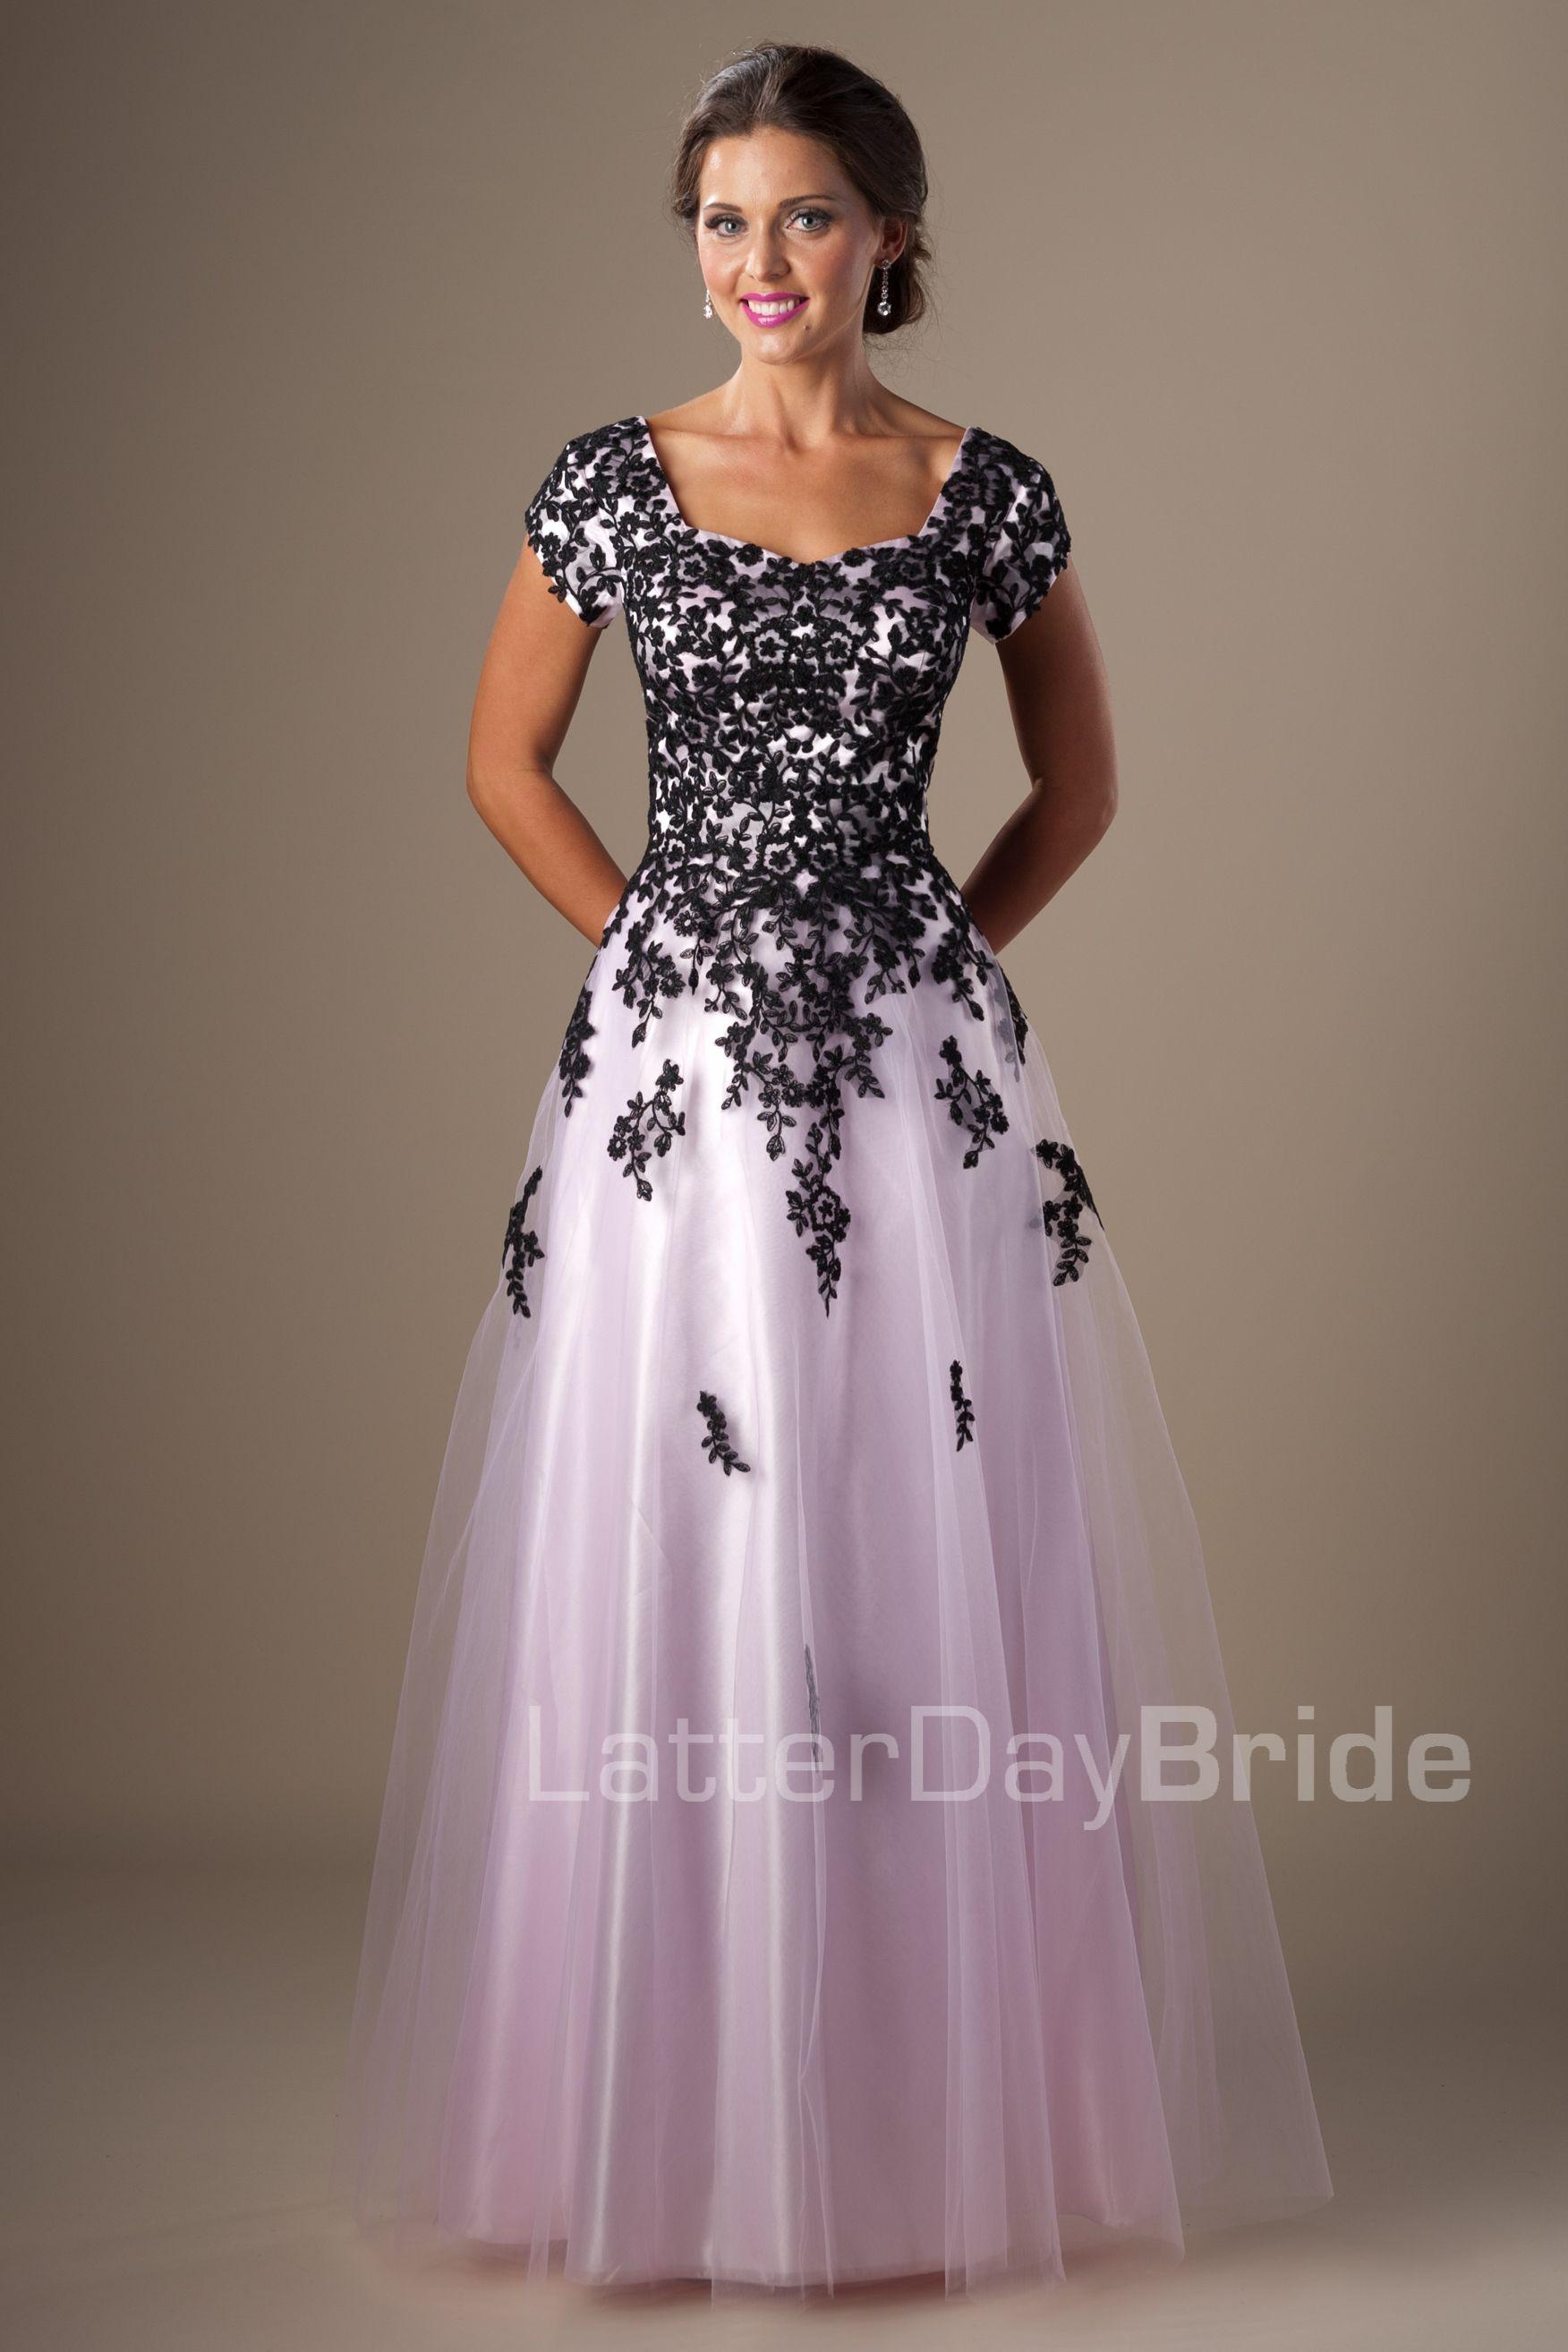 Modest prom dresses emma dresses pinterest modest prom